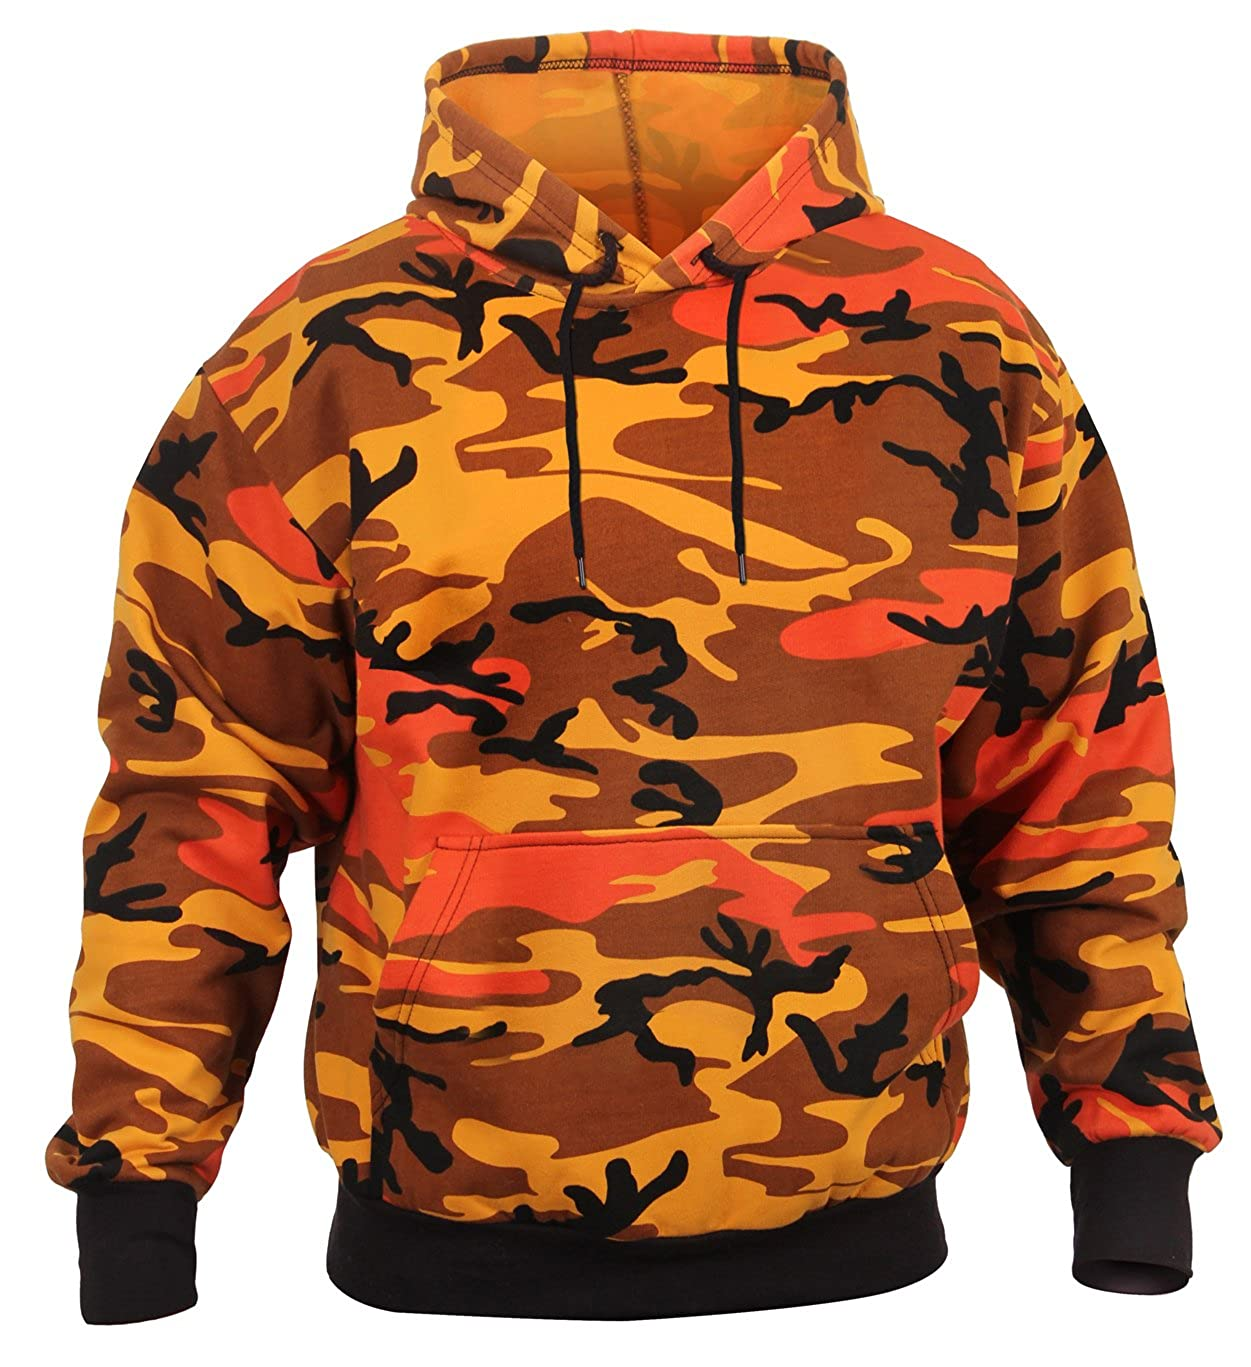 0280f392 Amazon.com: Rothco Camo Pullover Hooded Sweatshirt: Clothing